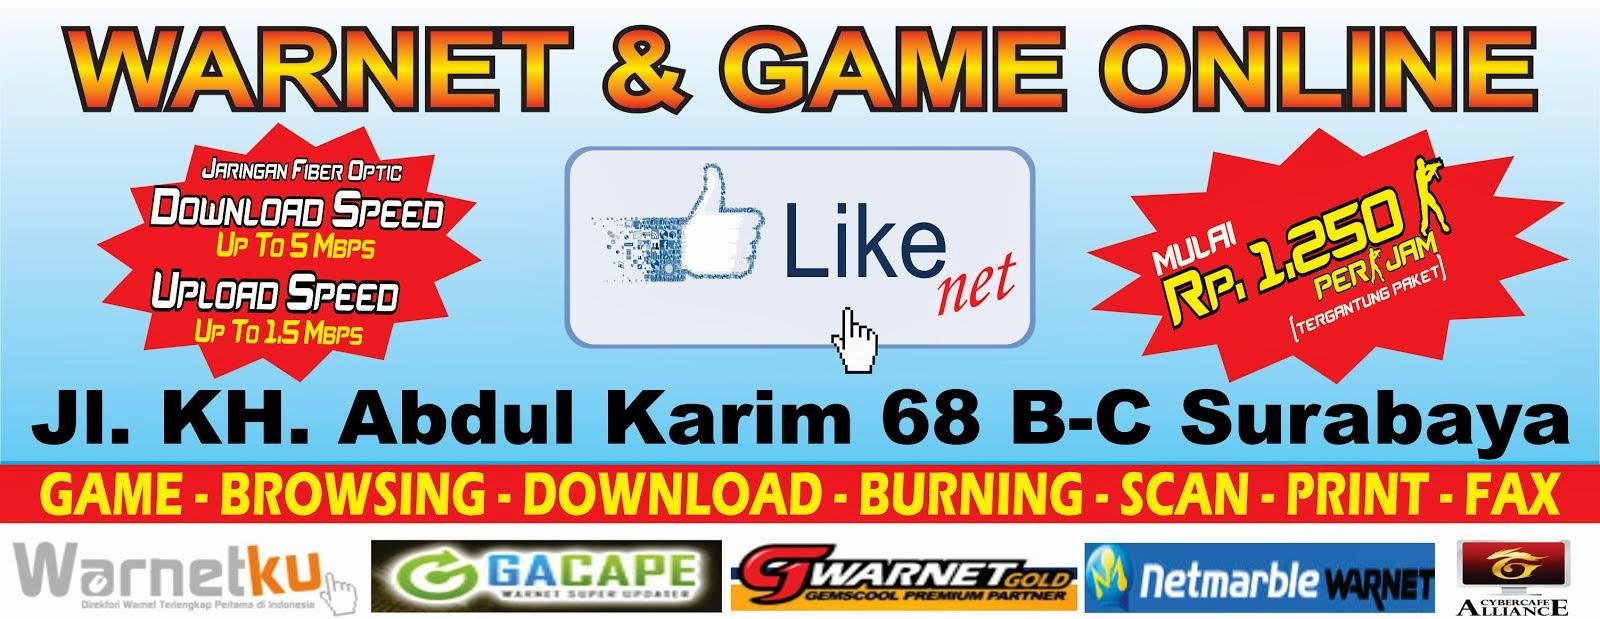 Like Net Surabaya (WARNET & GAME ONLINE TERCEPAT)